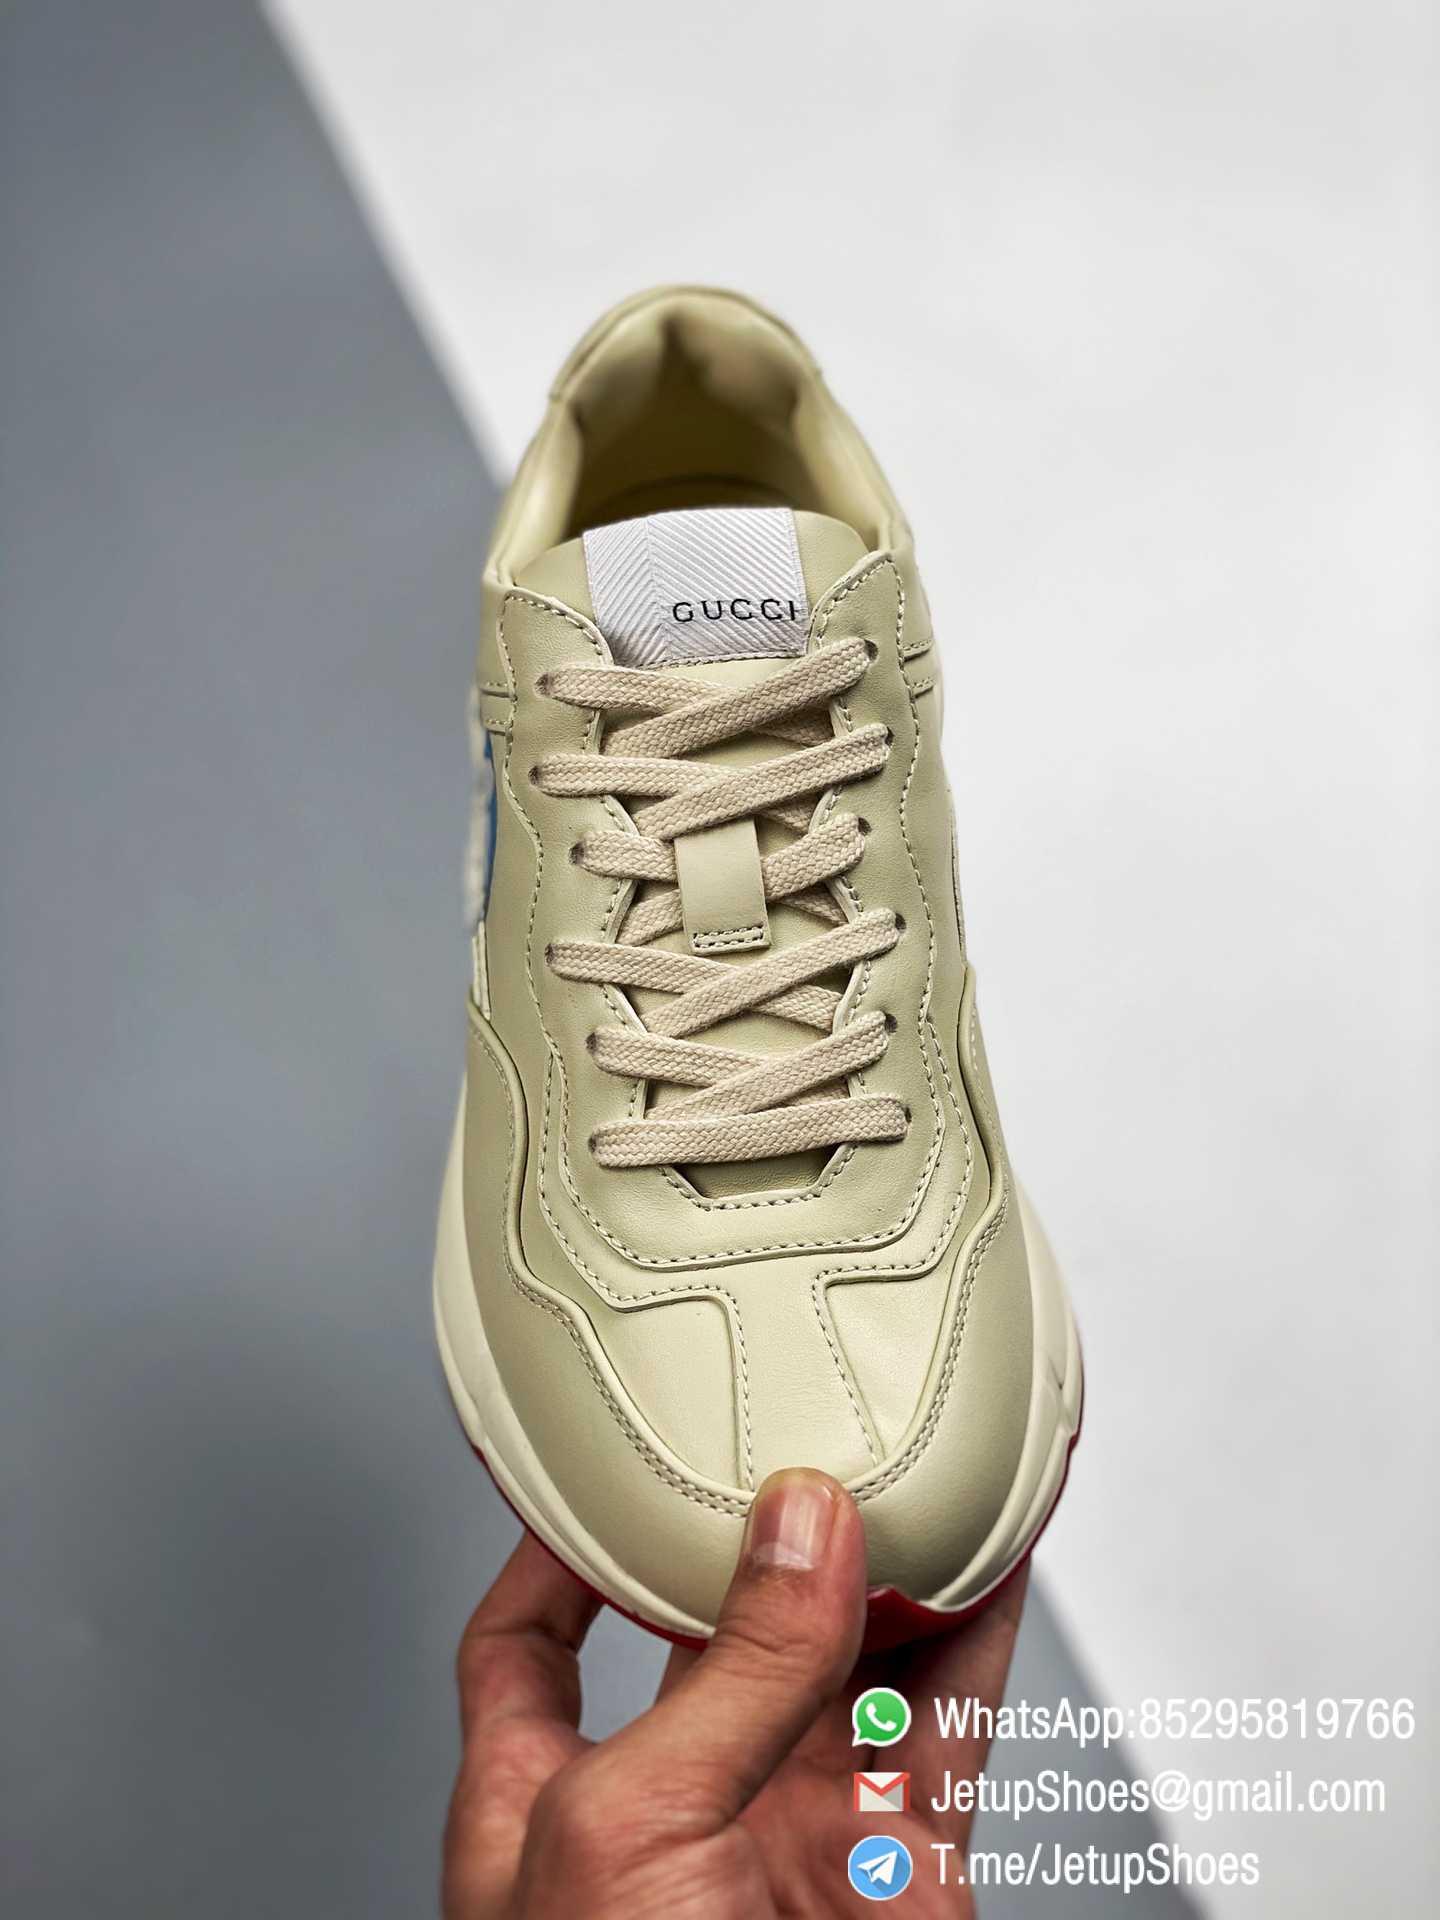 Doraemon x Gucci womens Rhyton Sneaker Special Collaboration Sneakers SKU 655037 DRW00 9522 03